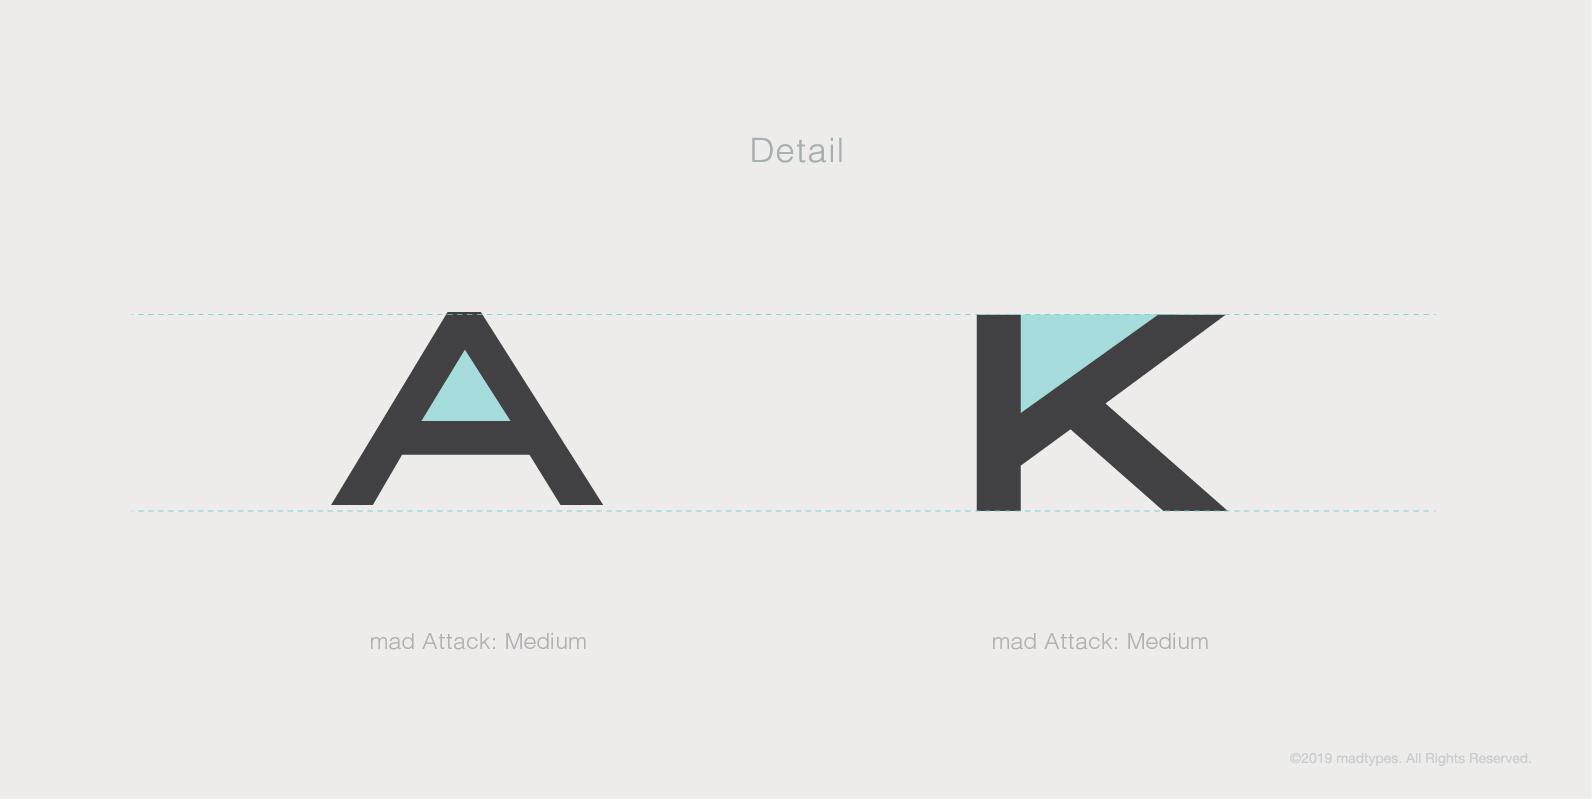 madtypesweb_info_madattack_c1_r1_pook_8.jpg